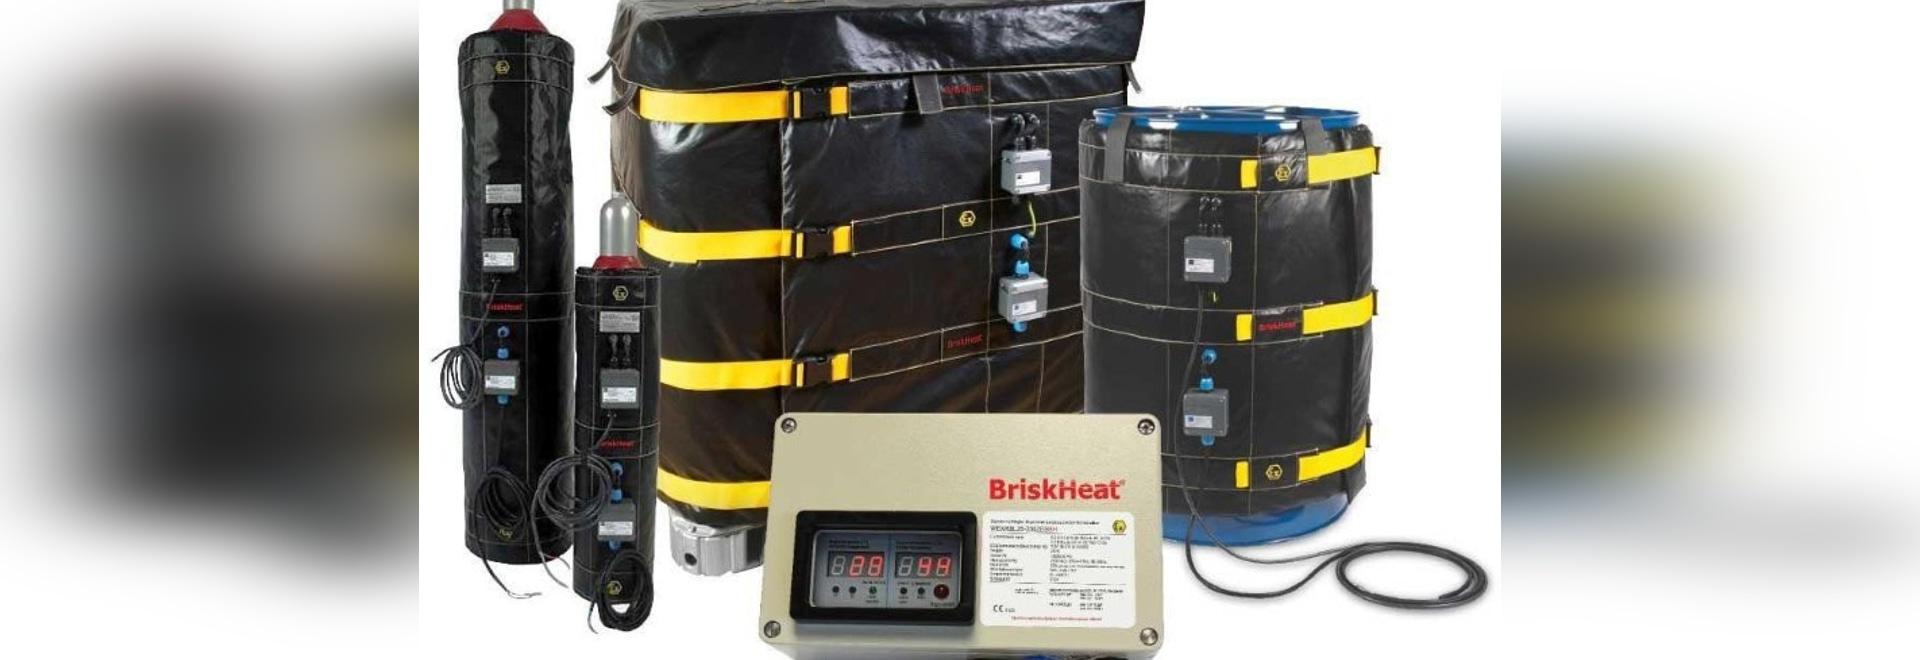 ATEX heaters from BriskHeat.